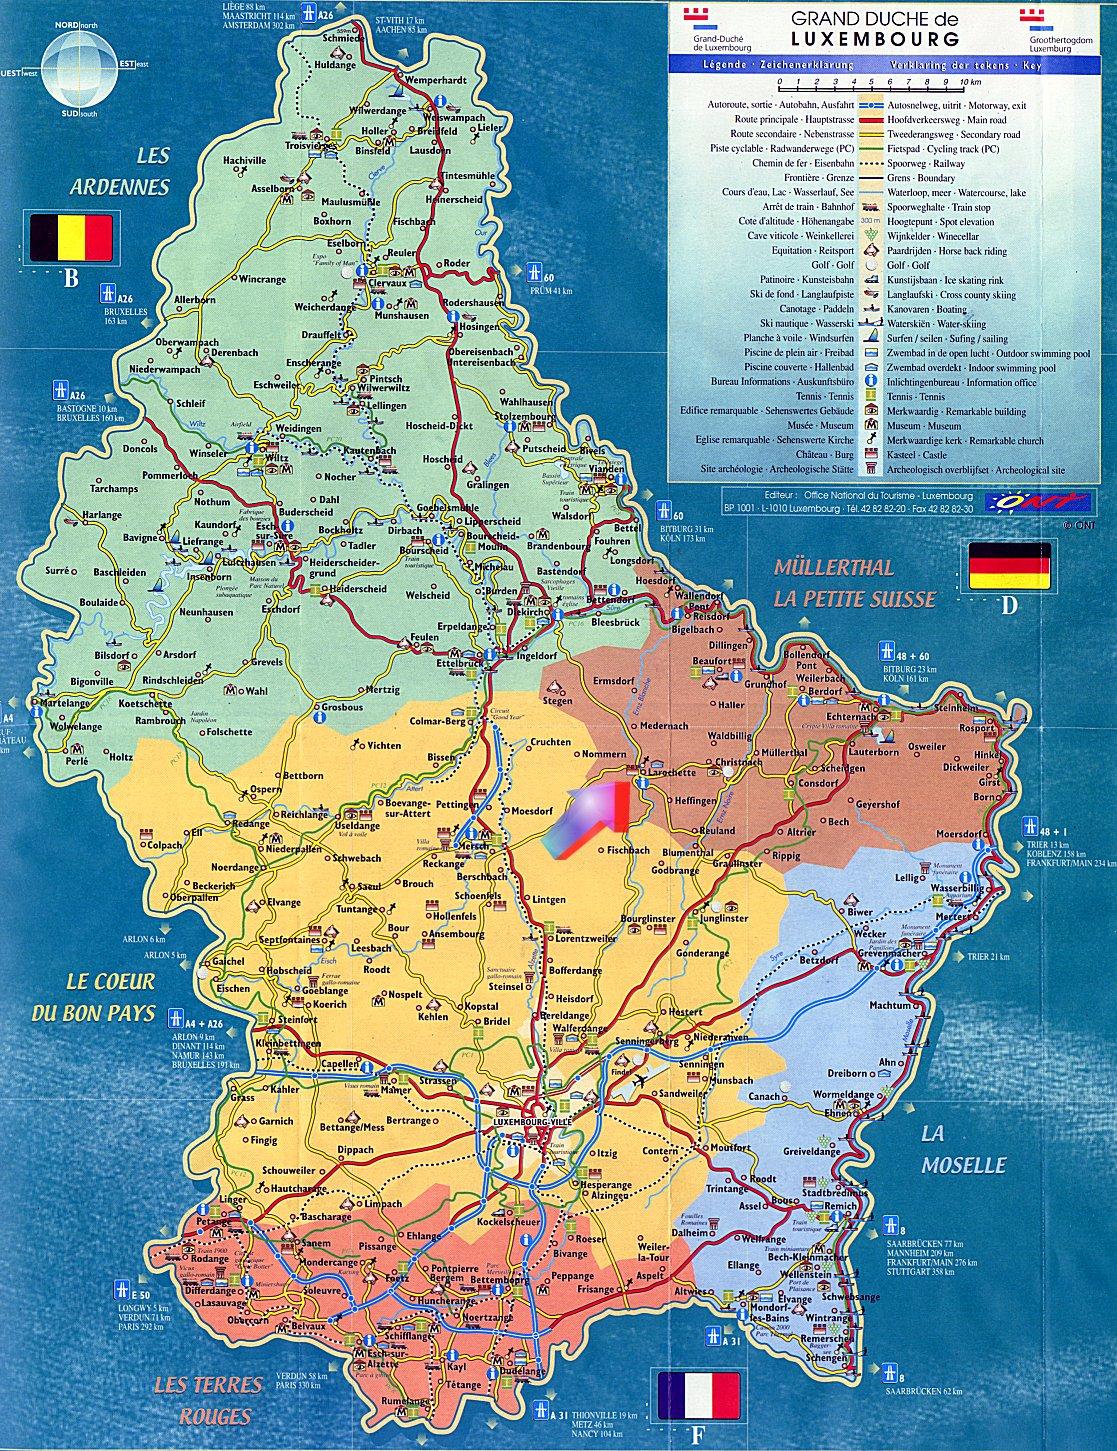 Mapas do Luxemburgo 3